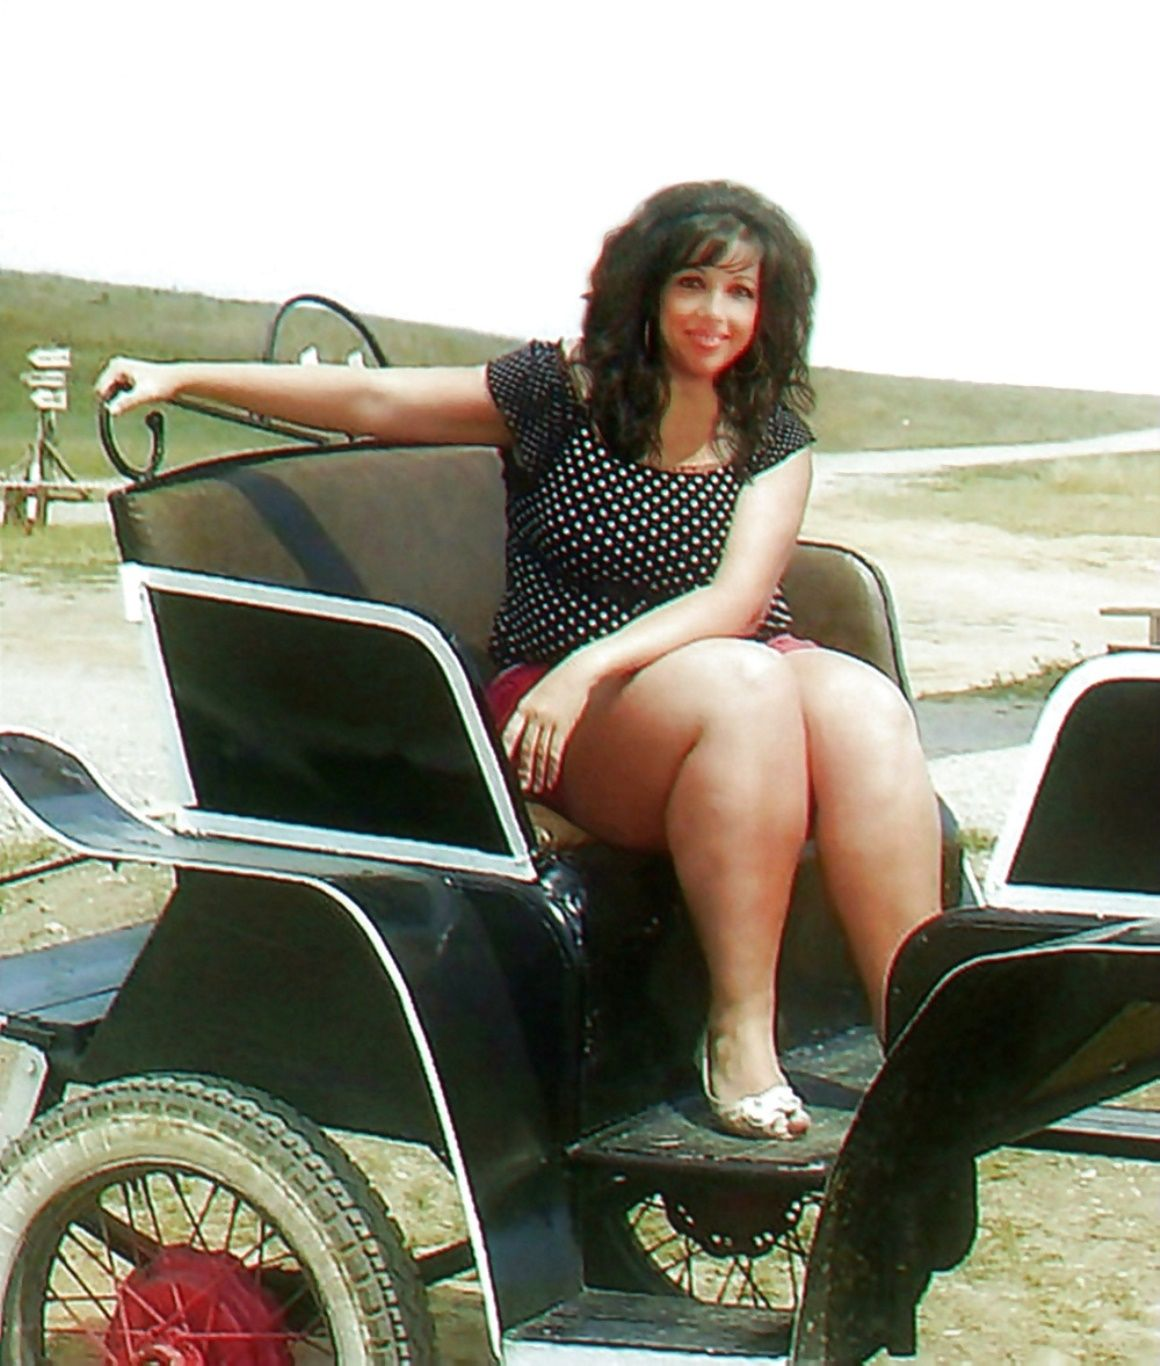 big legs pretty woman | big legs | pinterest | big legs, pretty